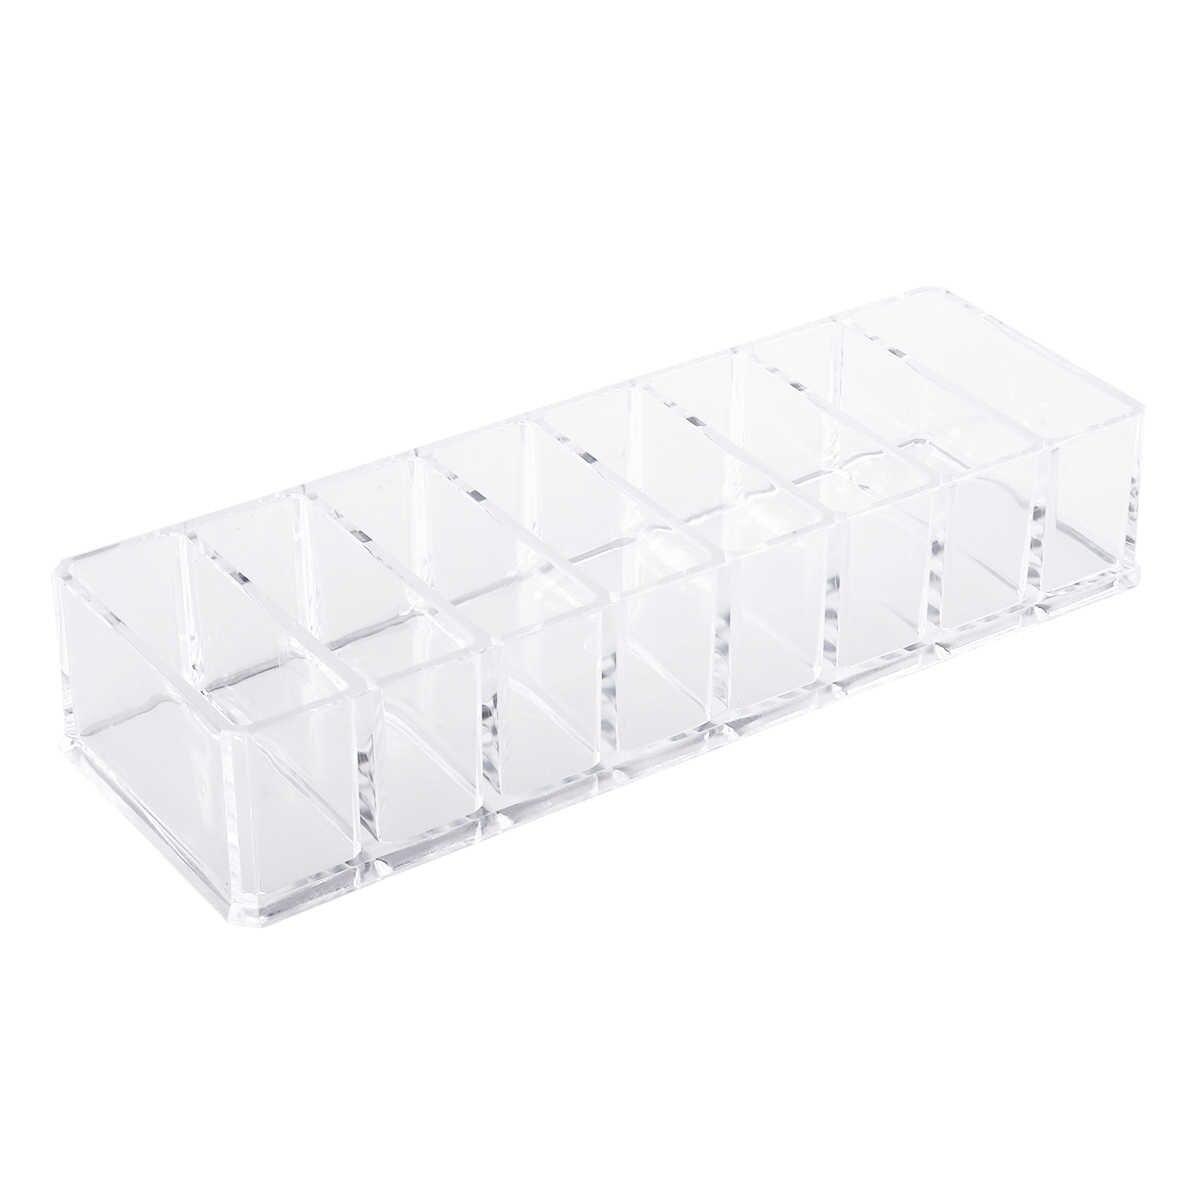 Acrylic Eyeshadow Organizer Lipstick Holder Cosmetic Storage Box Makeup Organizer Cosmetic Tool Sundries Display Box